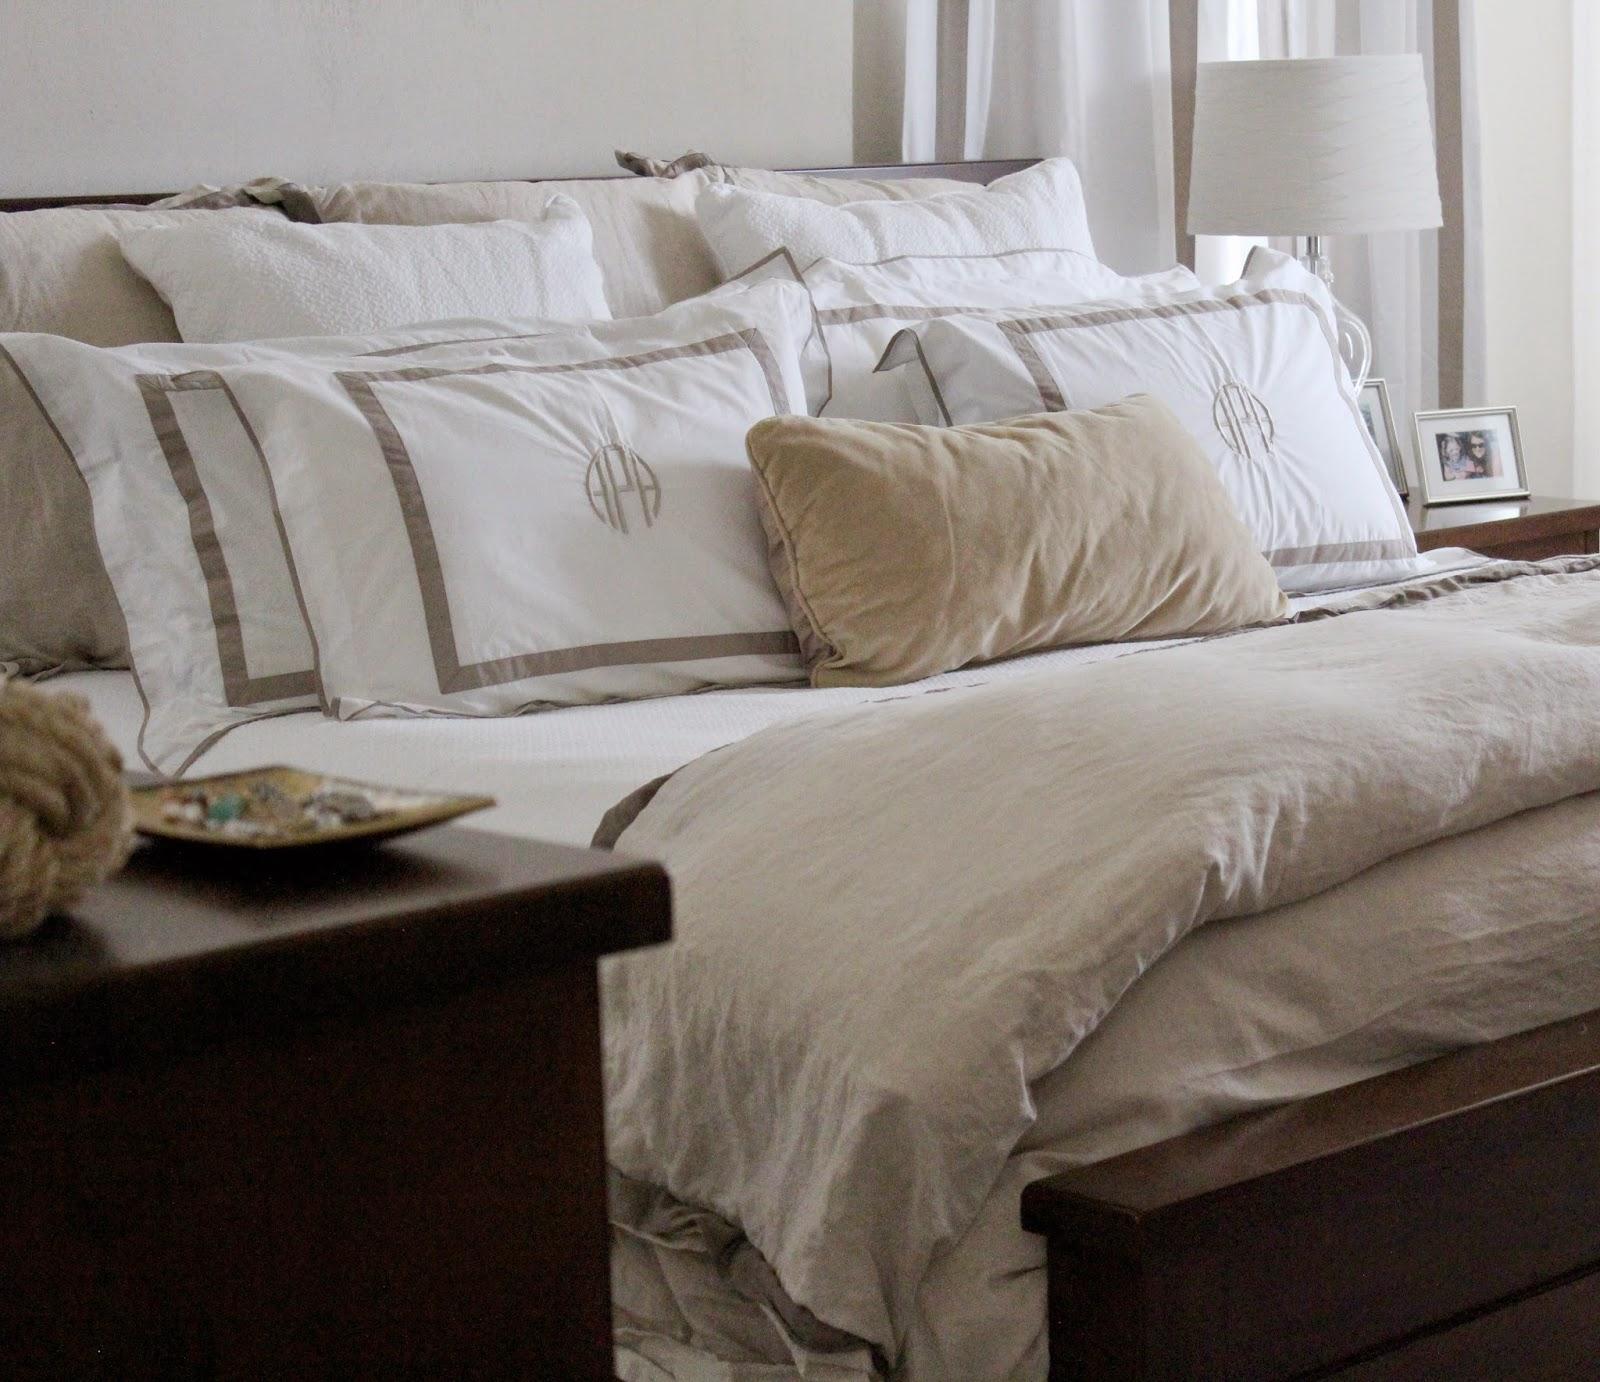 Sumatra Furniture, Linen, Bedding, Linen, Satin Trim, Monogram, Brownstone, White Sheets